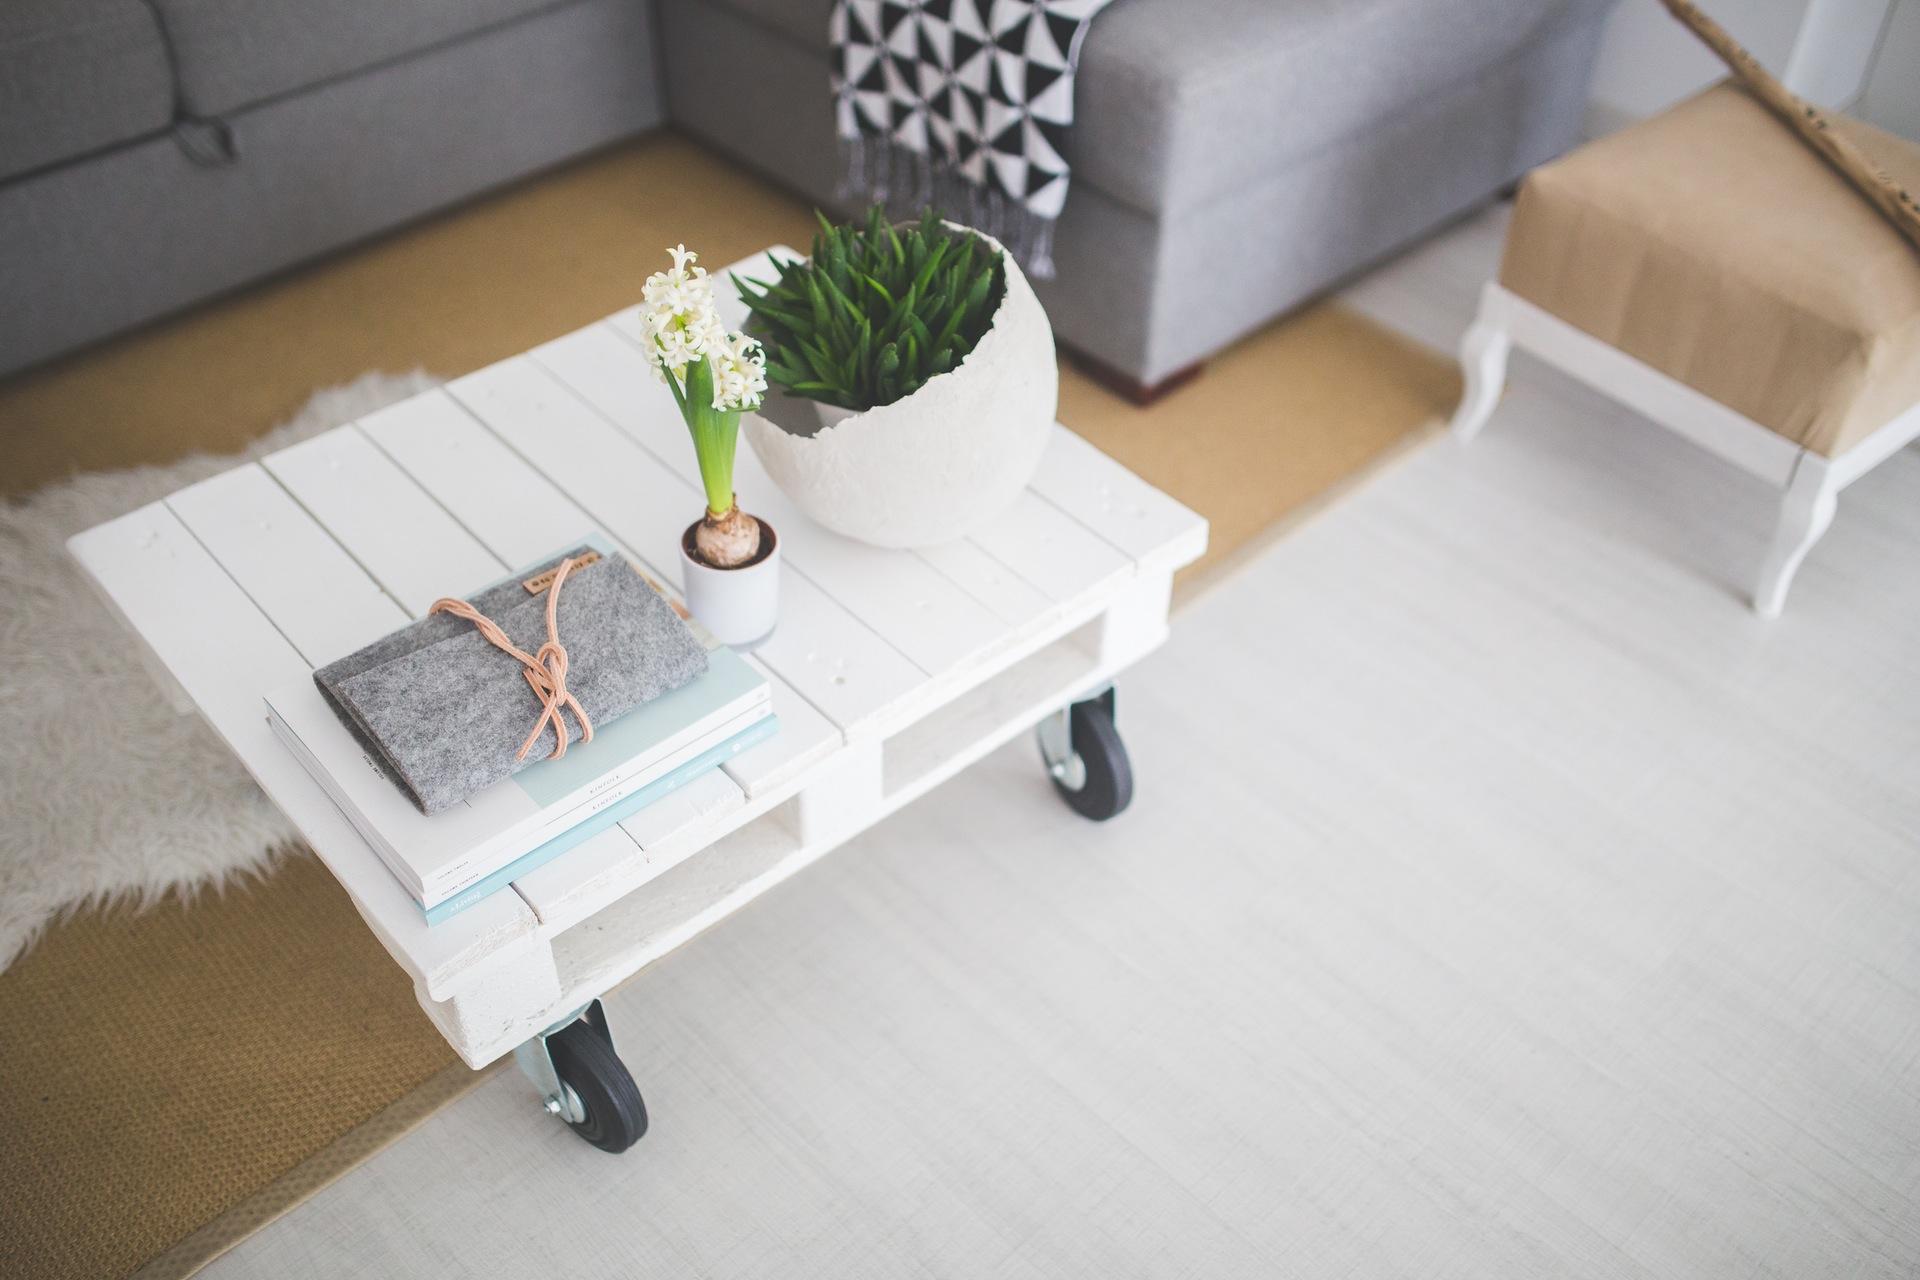 apartment-unique-succulents-plants-small-items